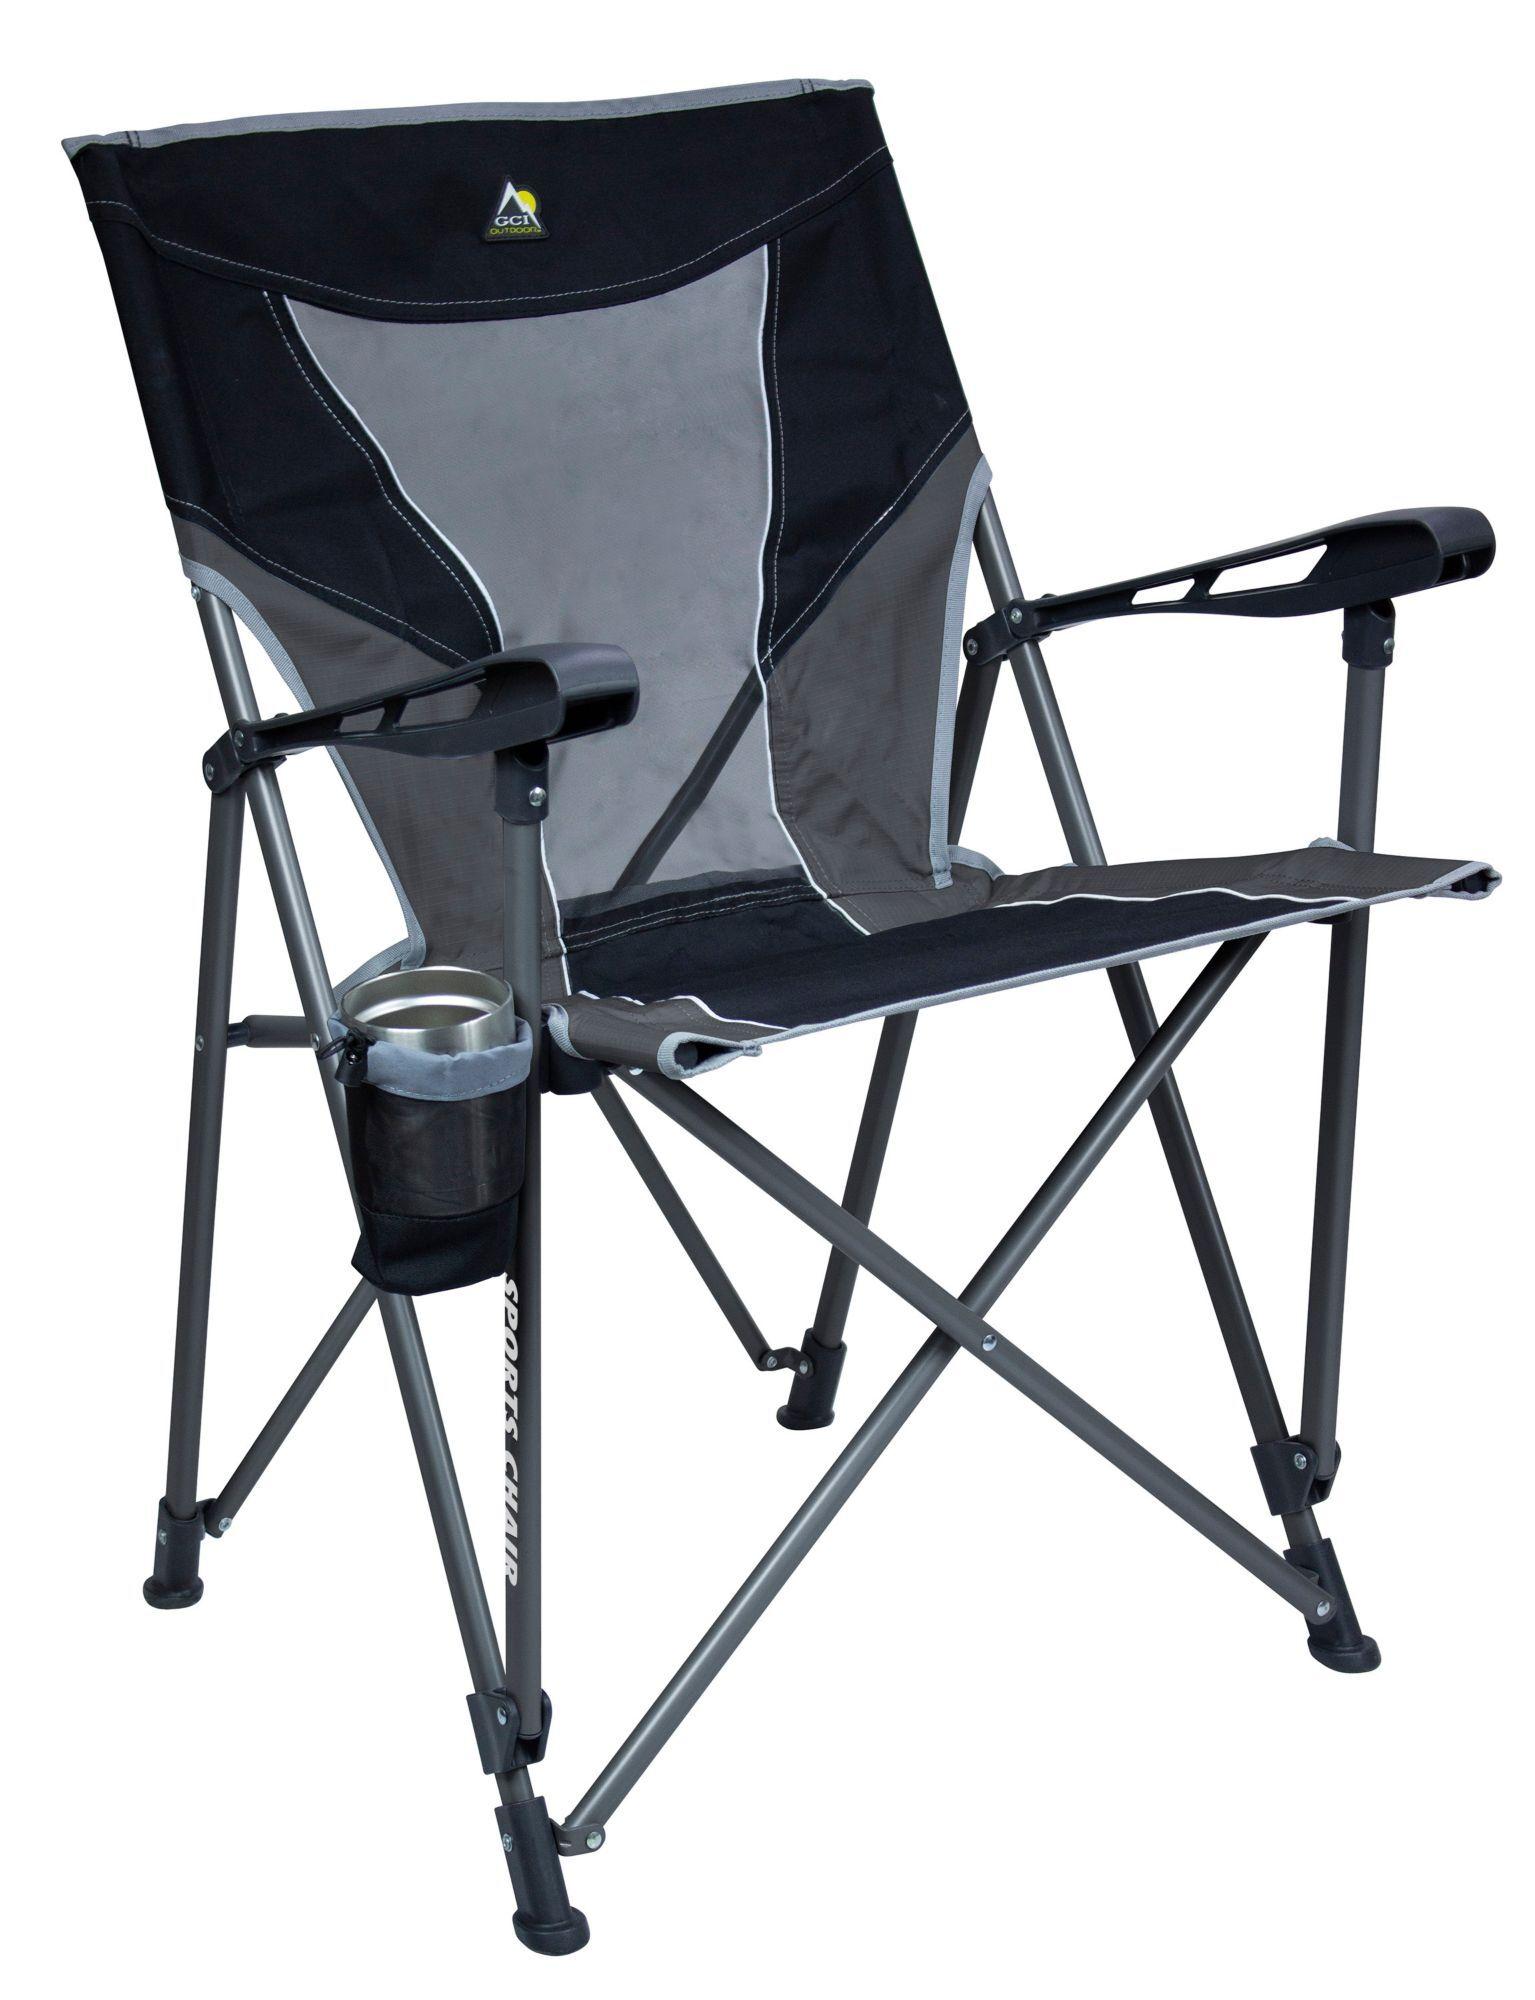 GCI Outdoor Sports Chair, Black